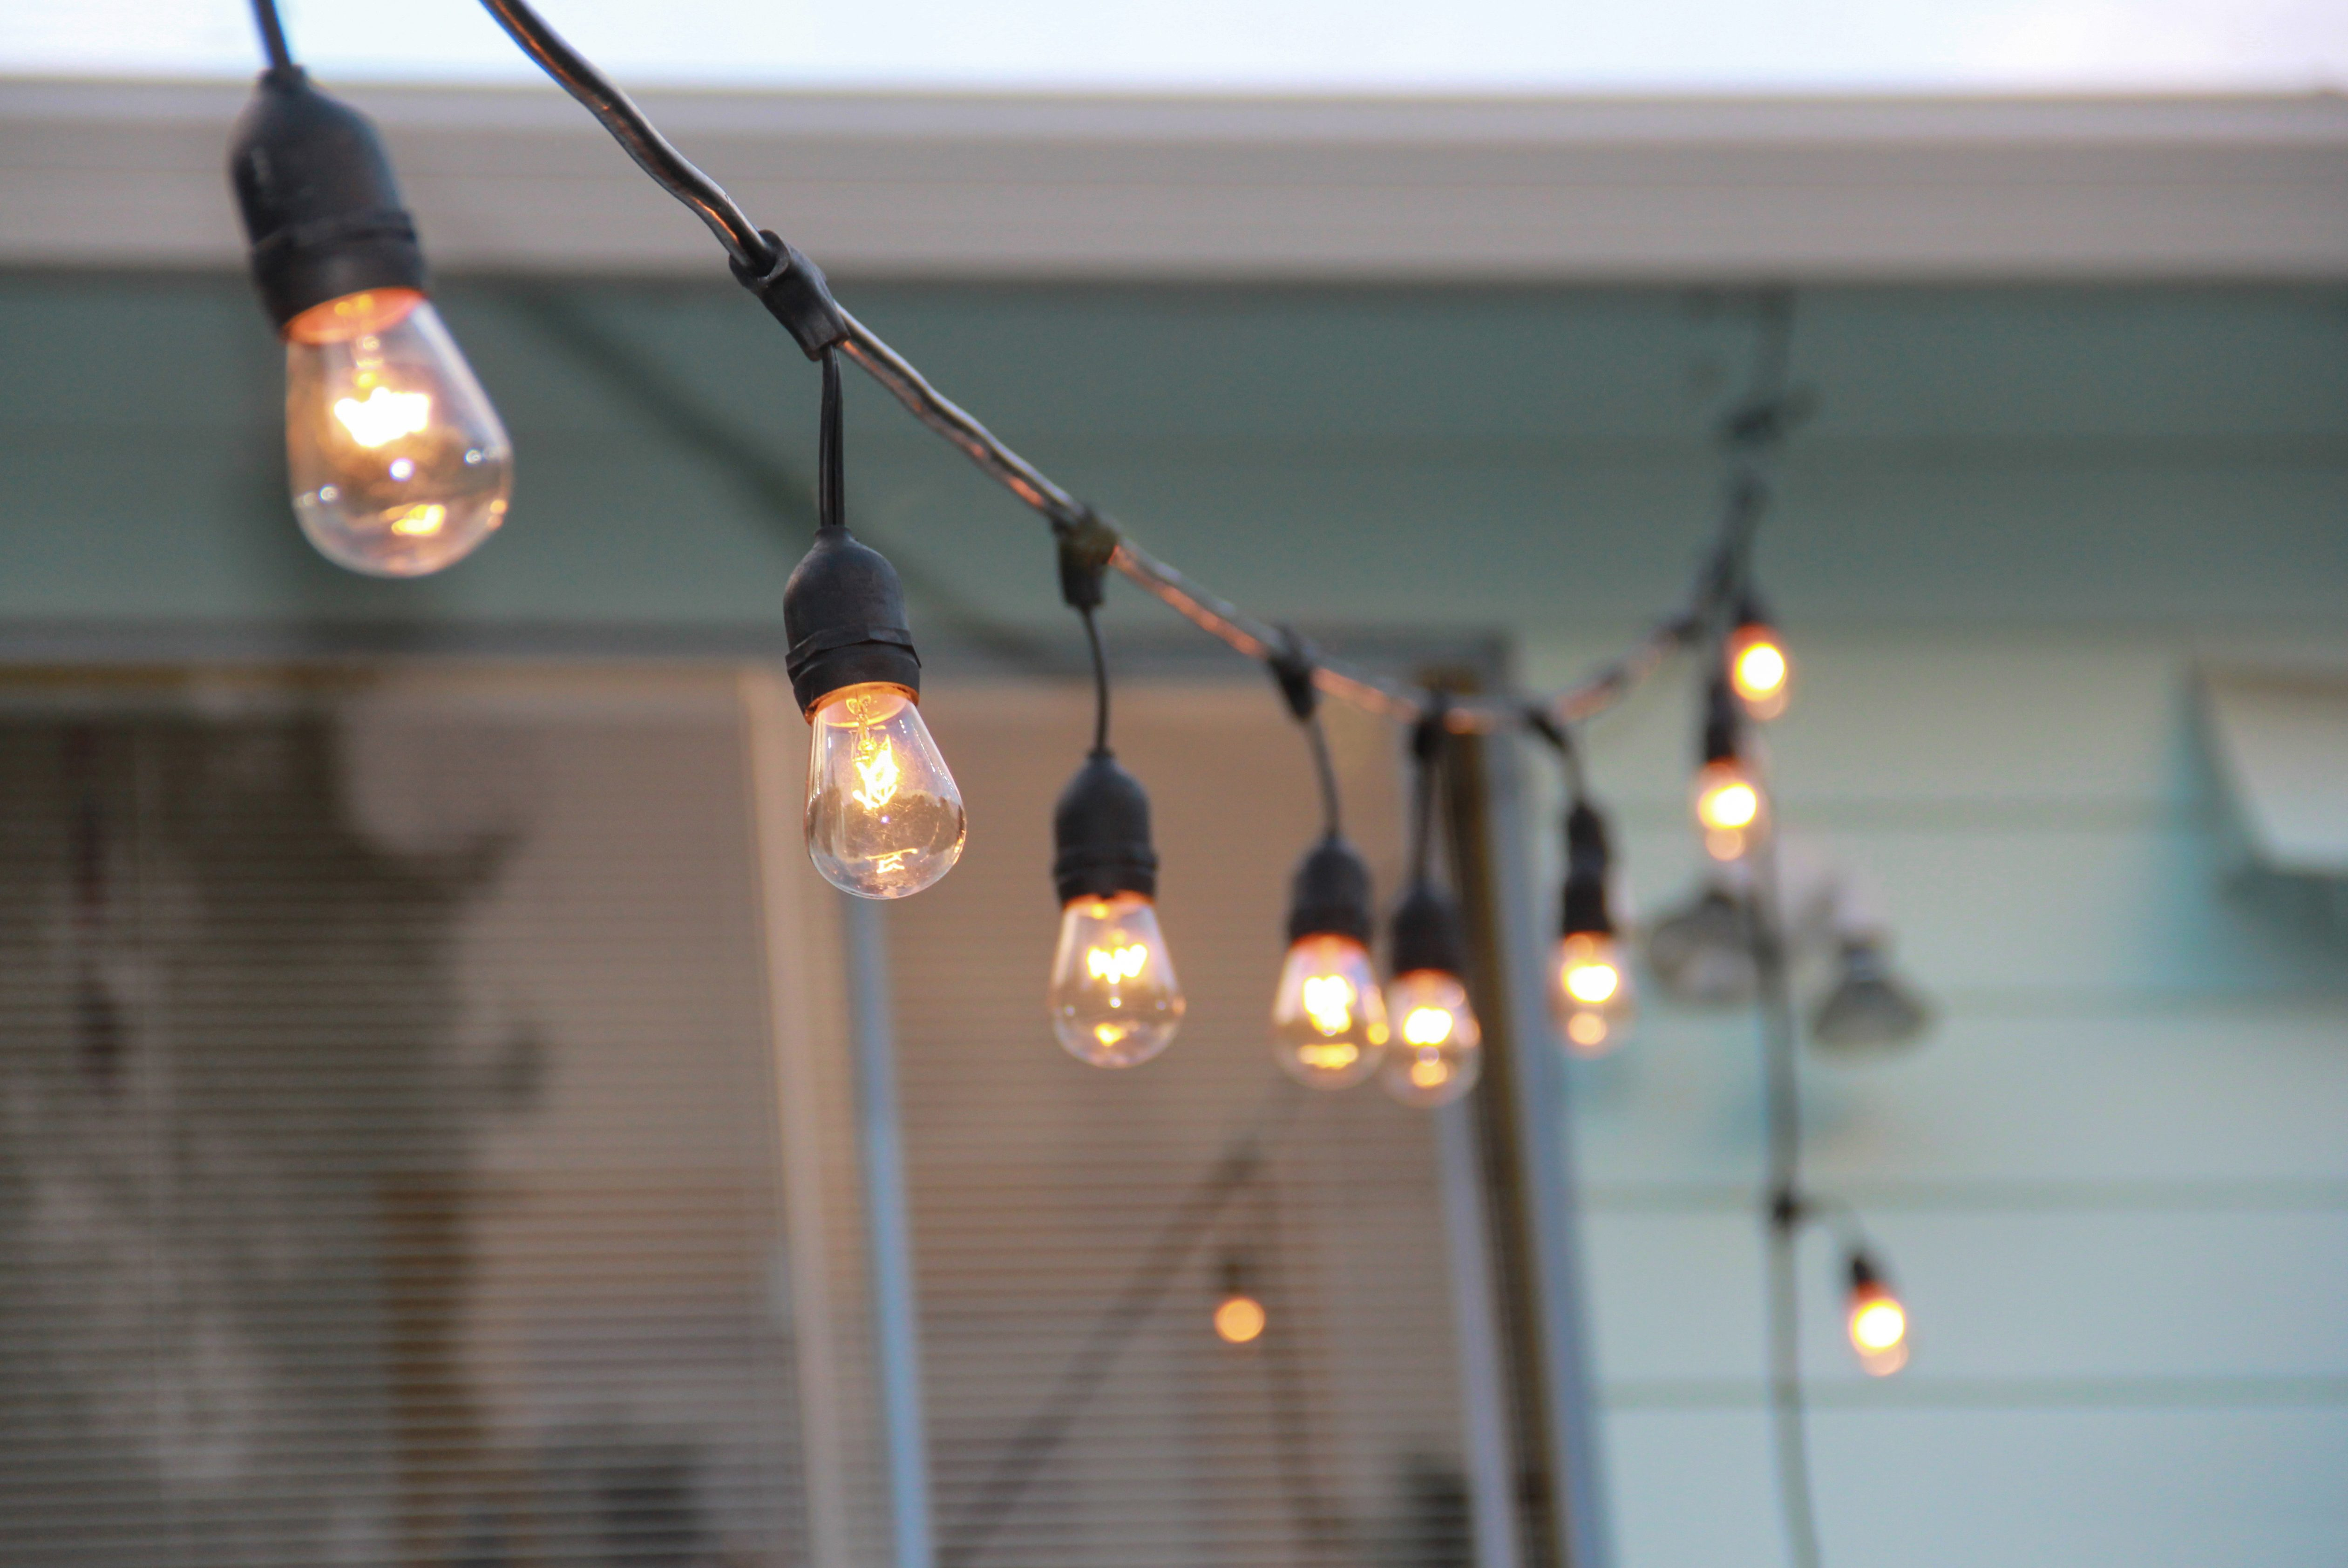 Illuminated string lights